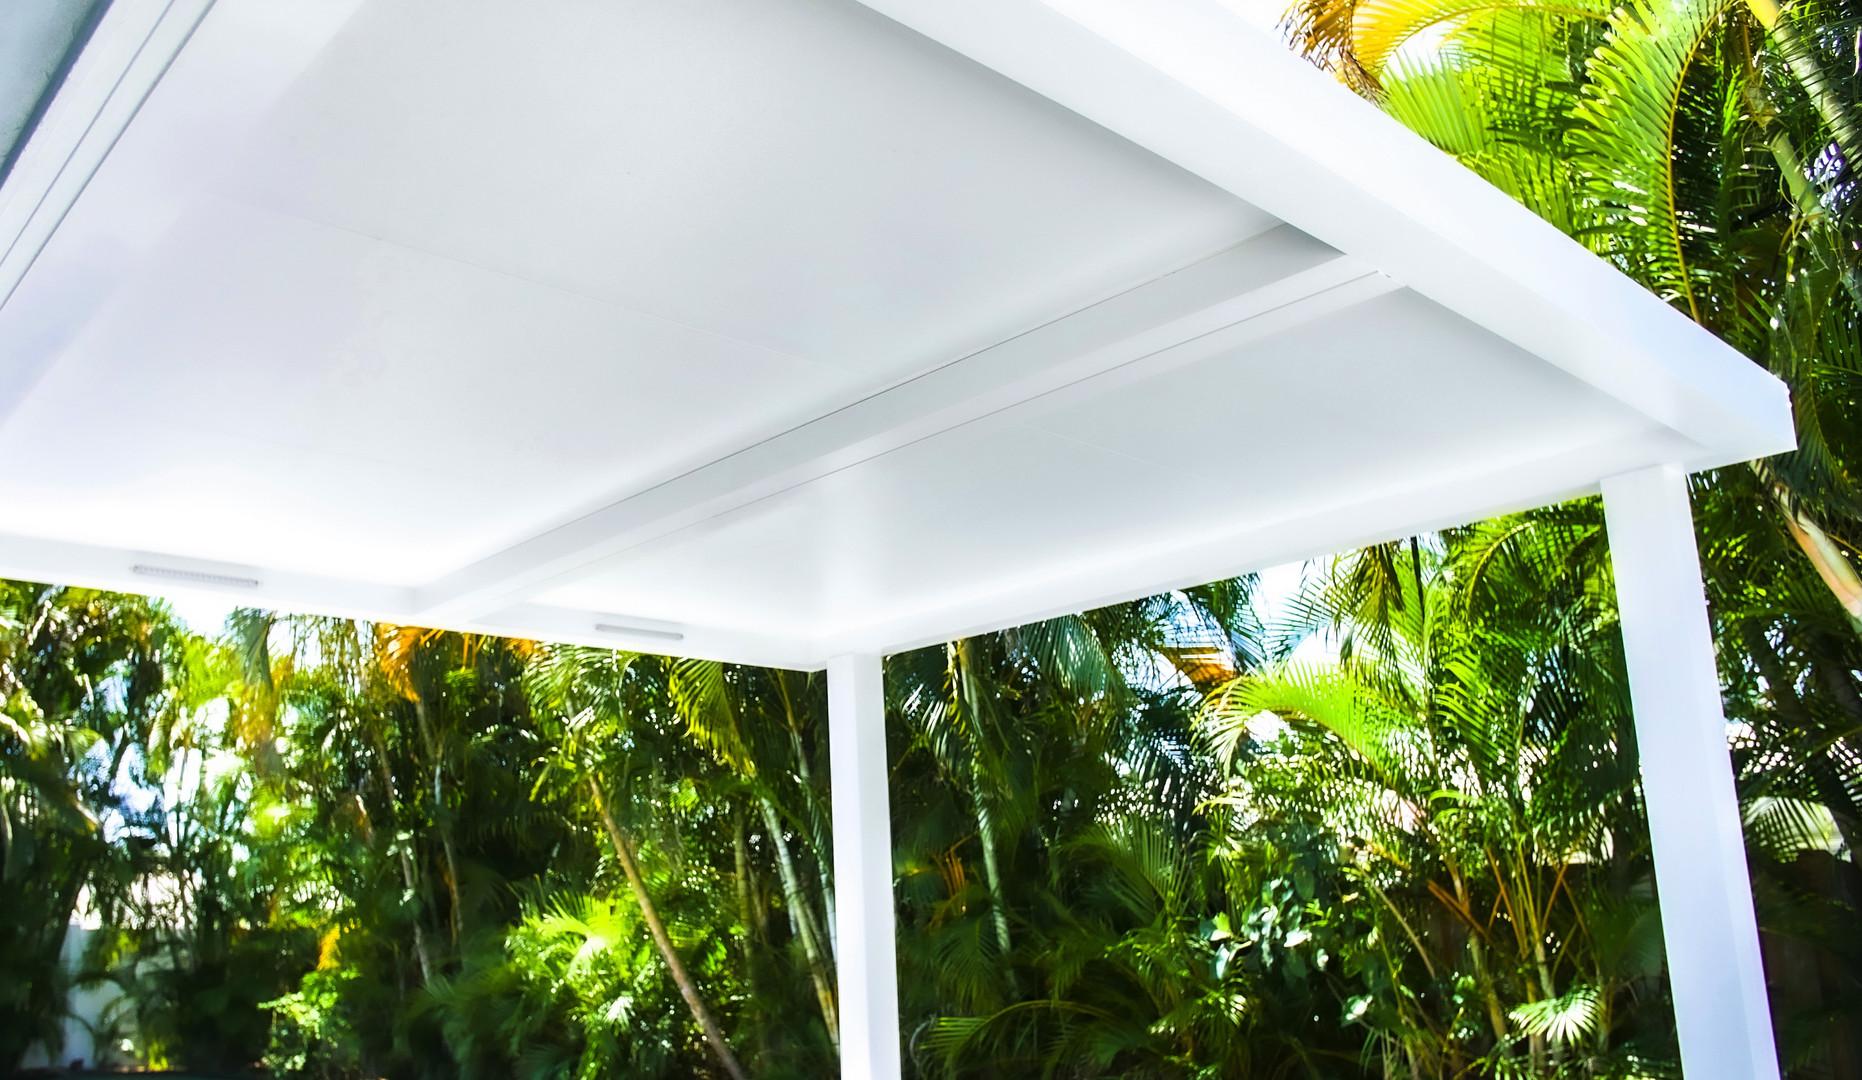 Full sun and rain protection.